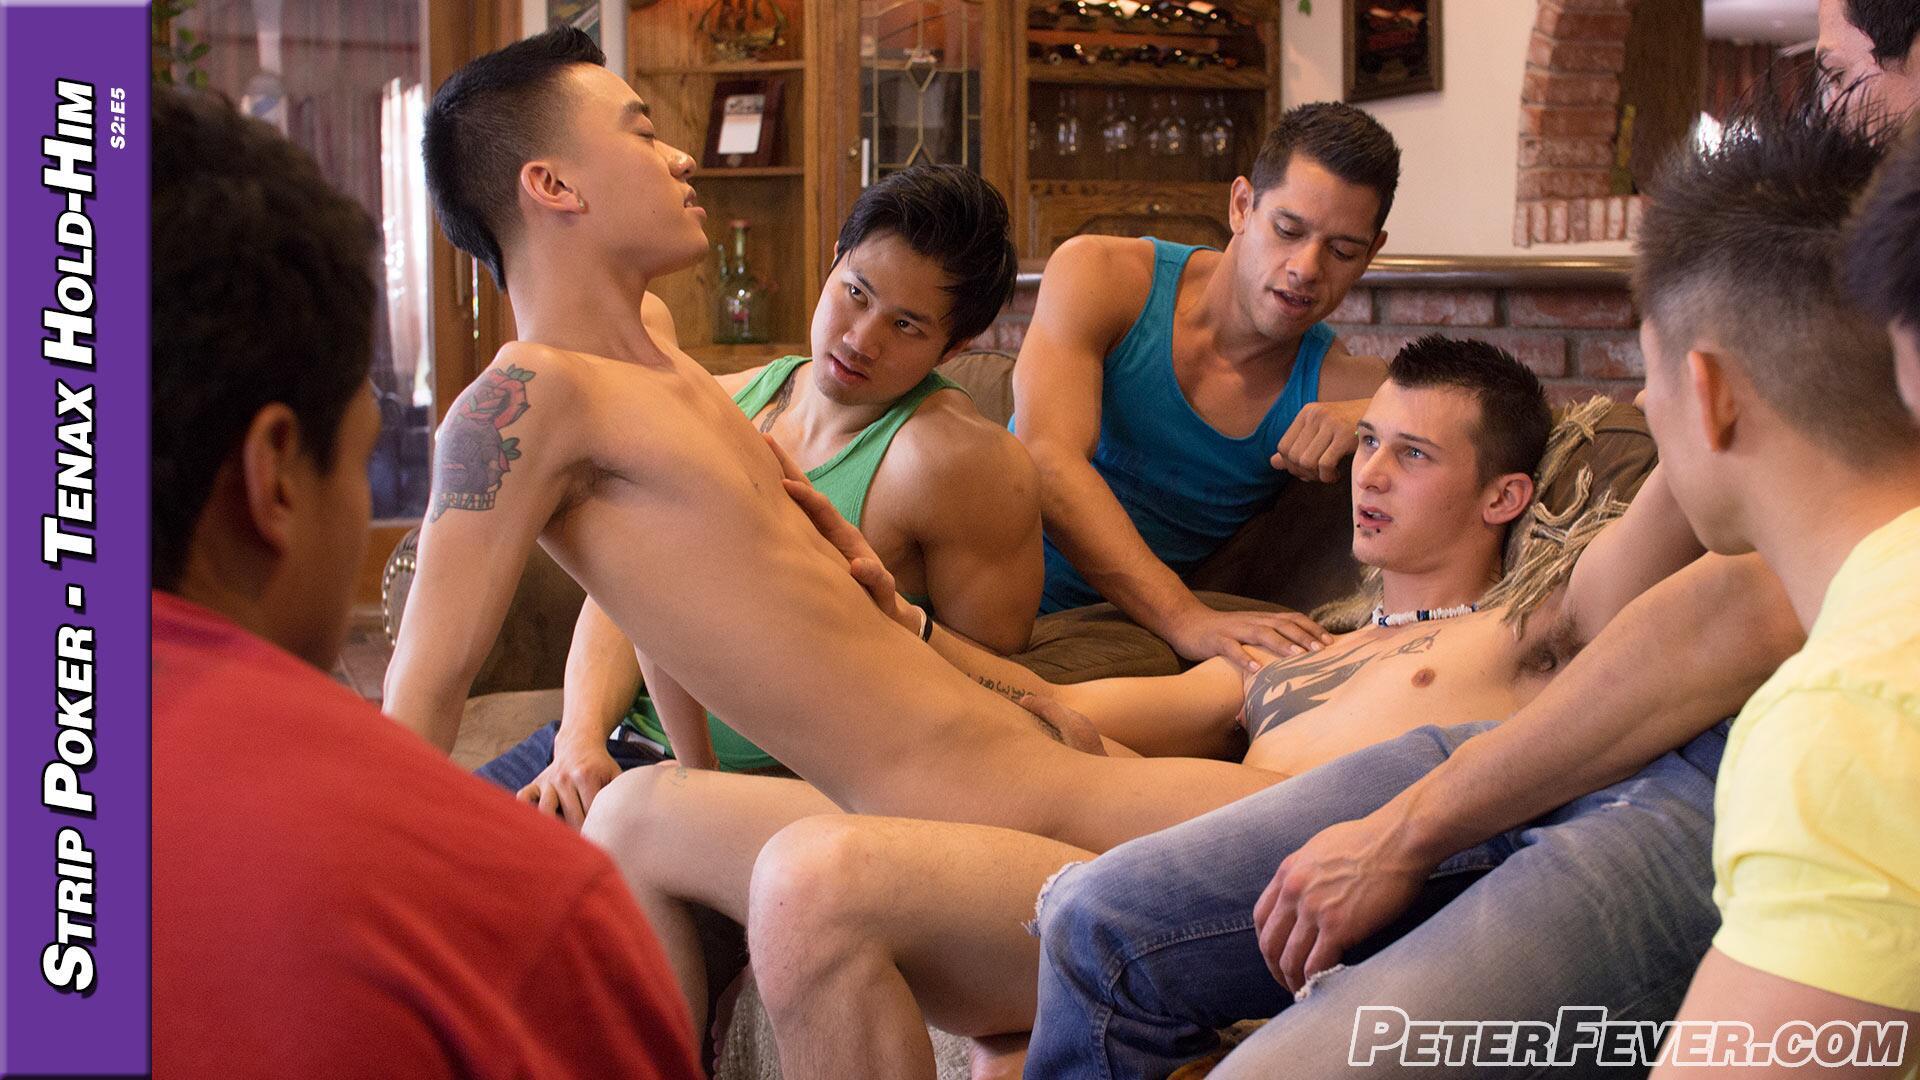 Naked gay men public